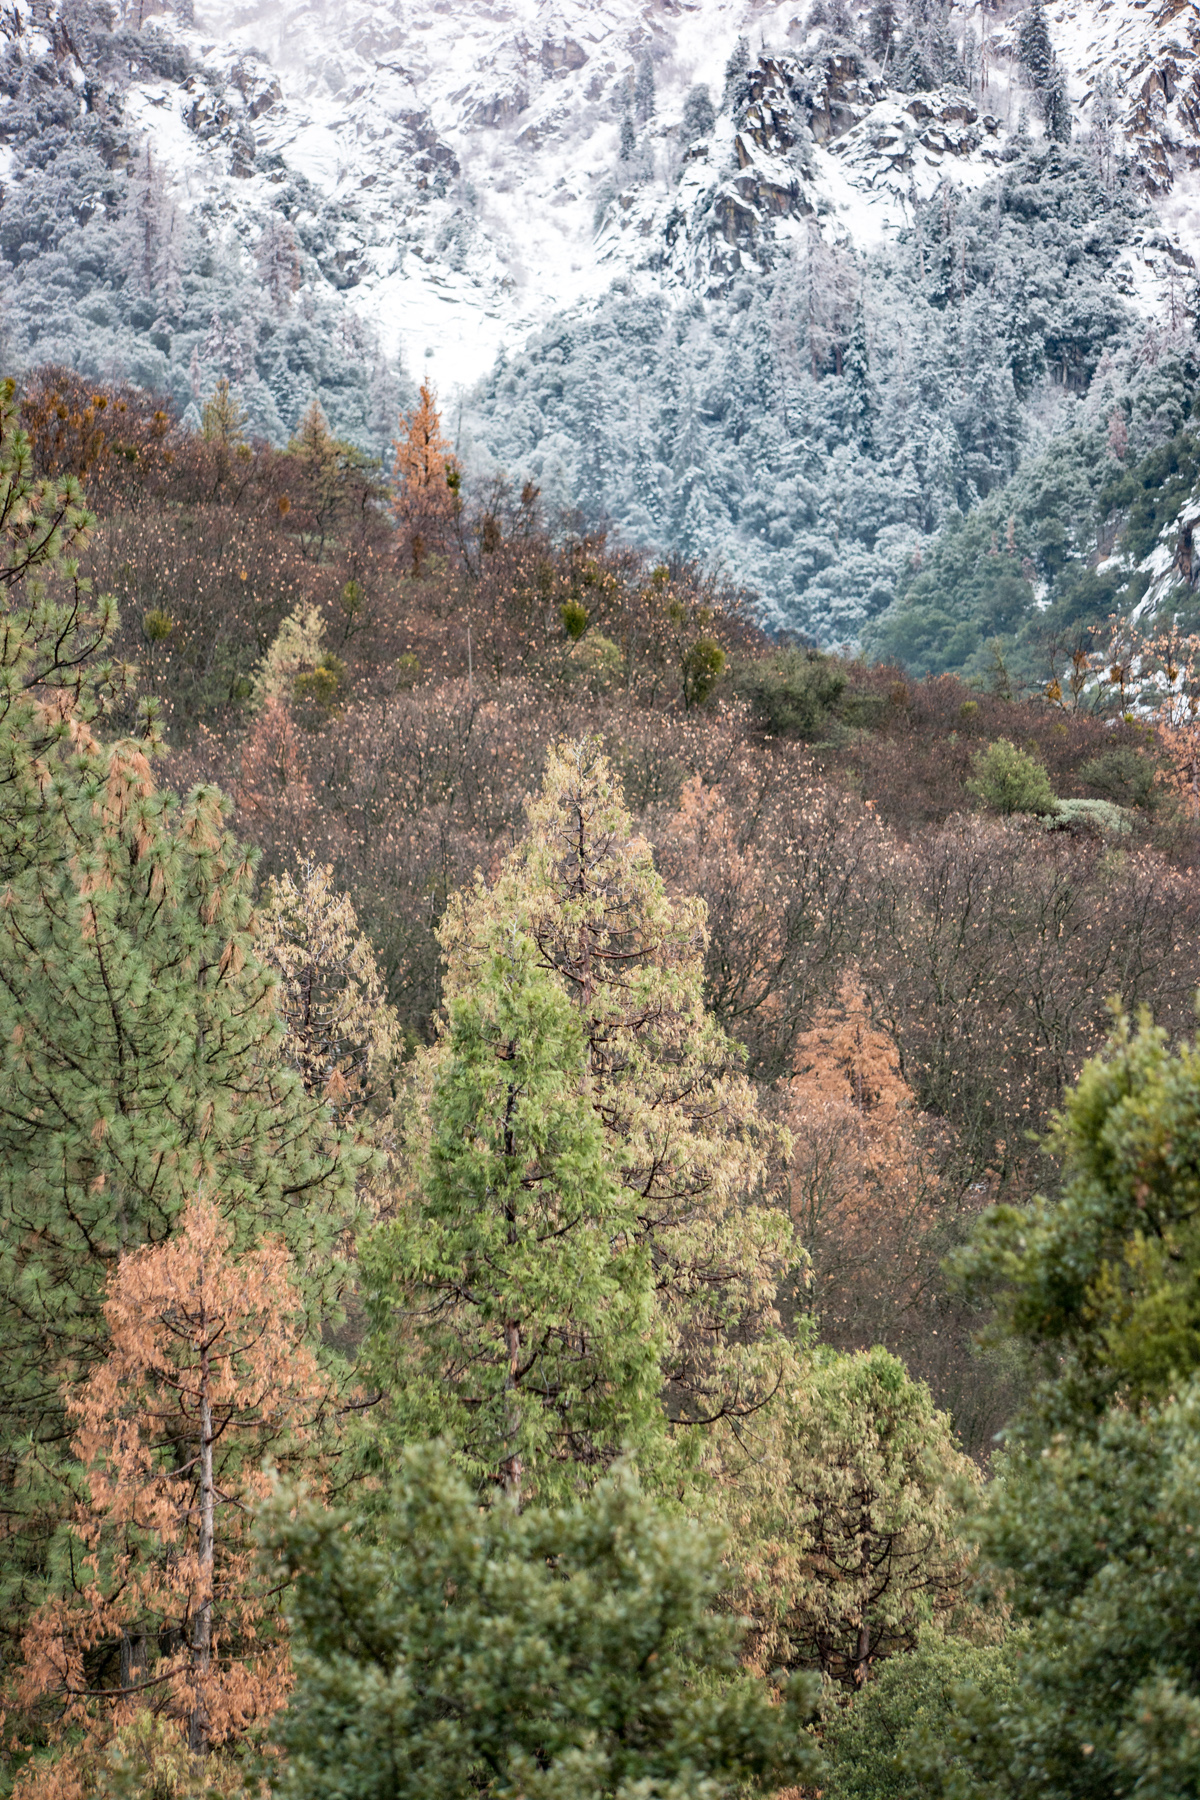 Wasim Muklashy Photography_Sequoia National Park_California_December 2015_-SAM_4288.jpg